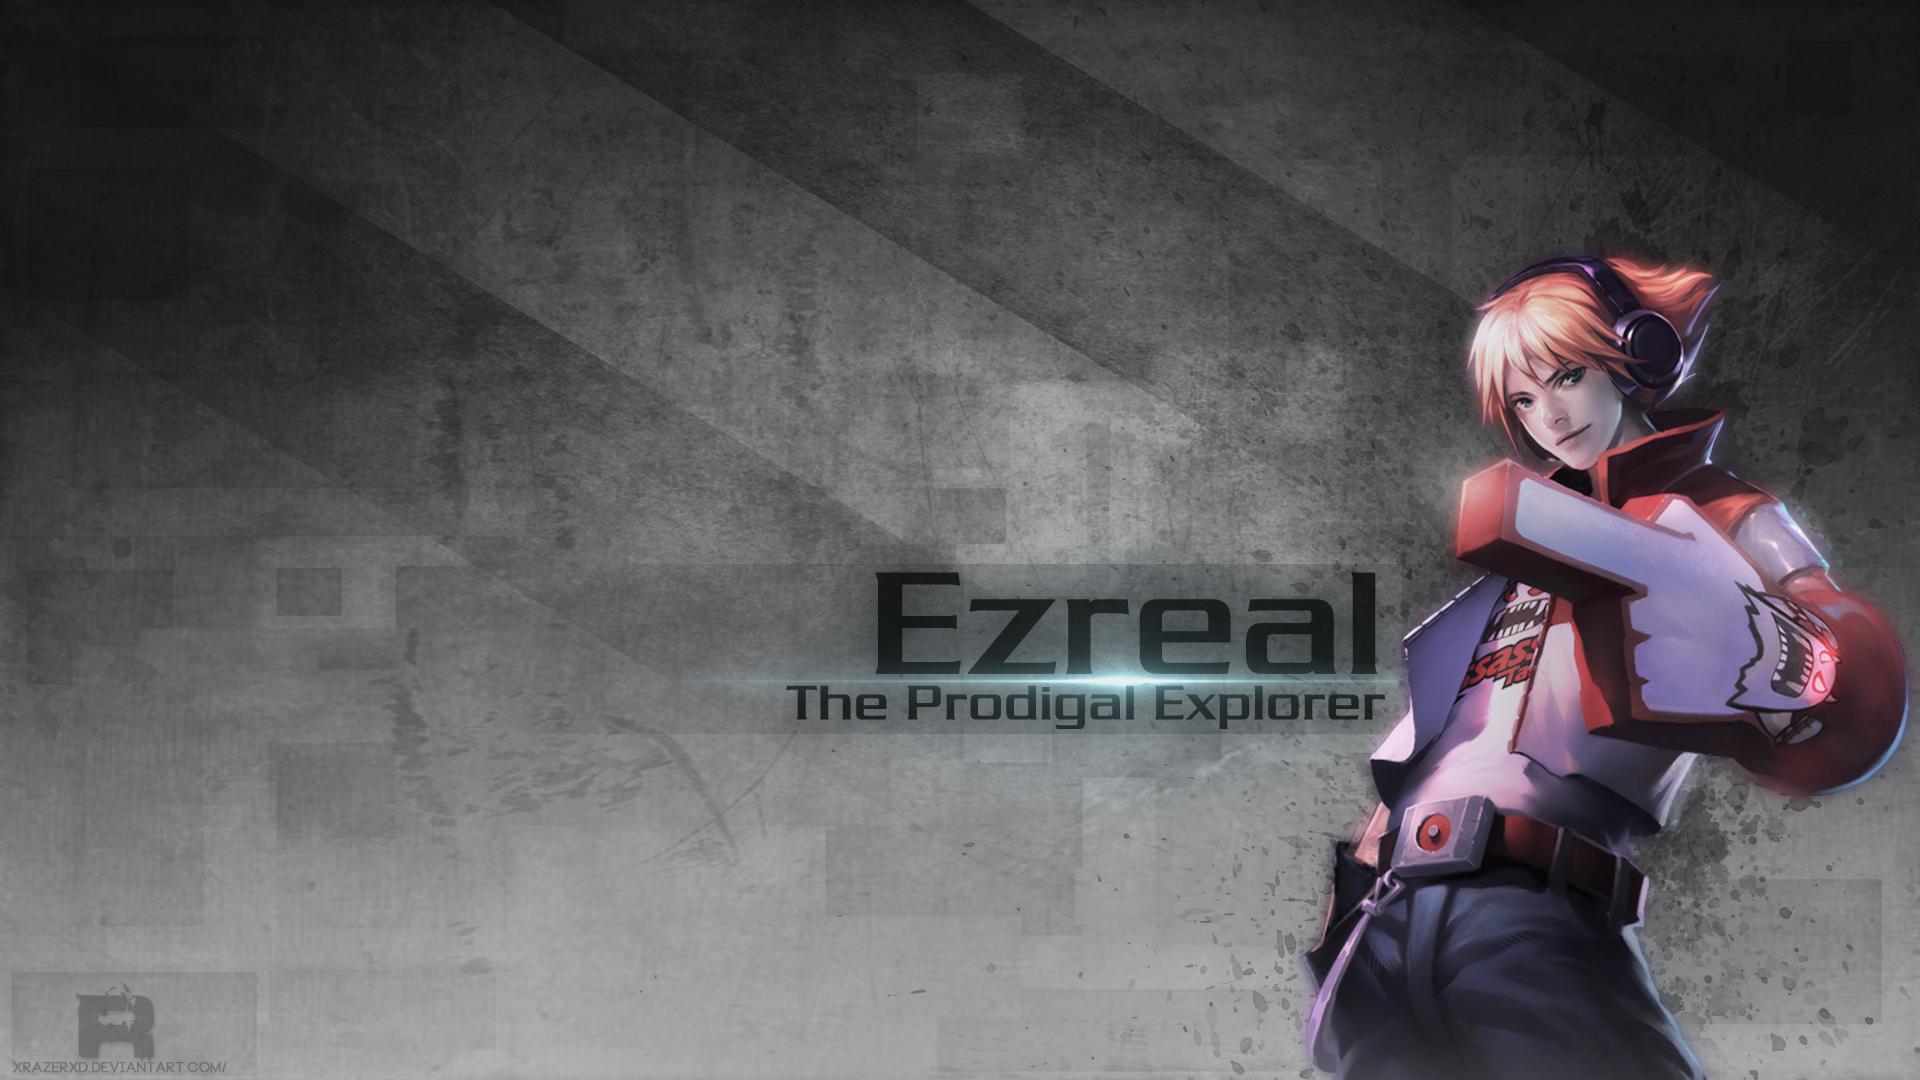 Ezreal – The Prodigal Explorer wallpaper